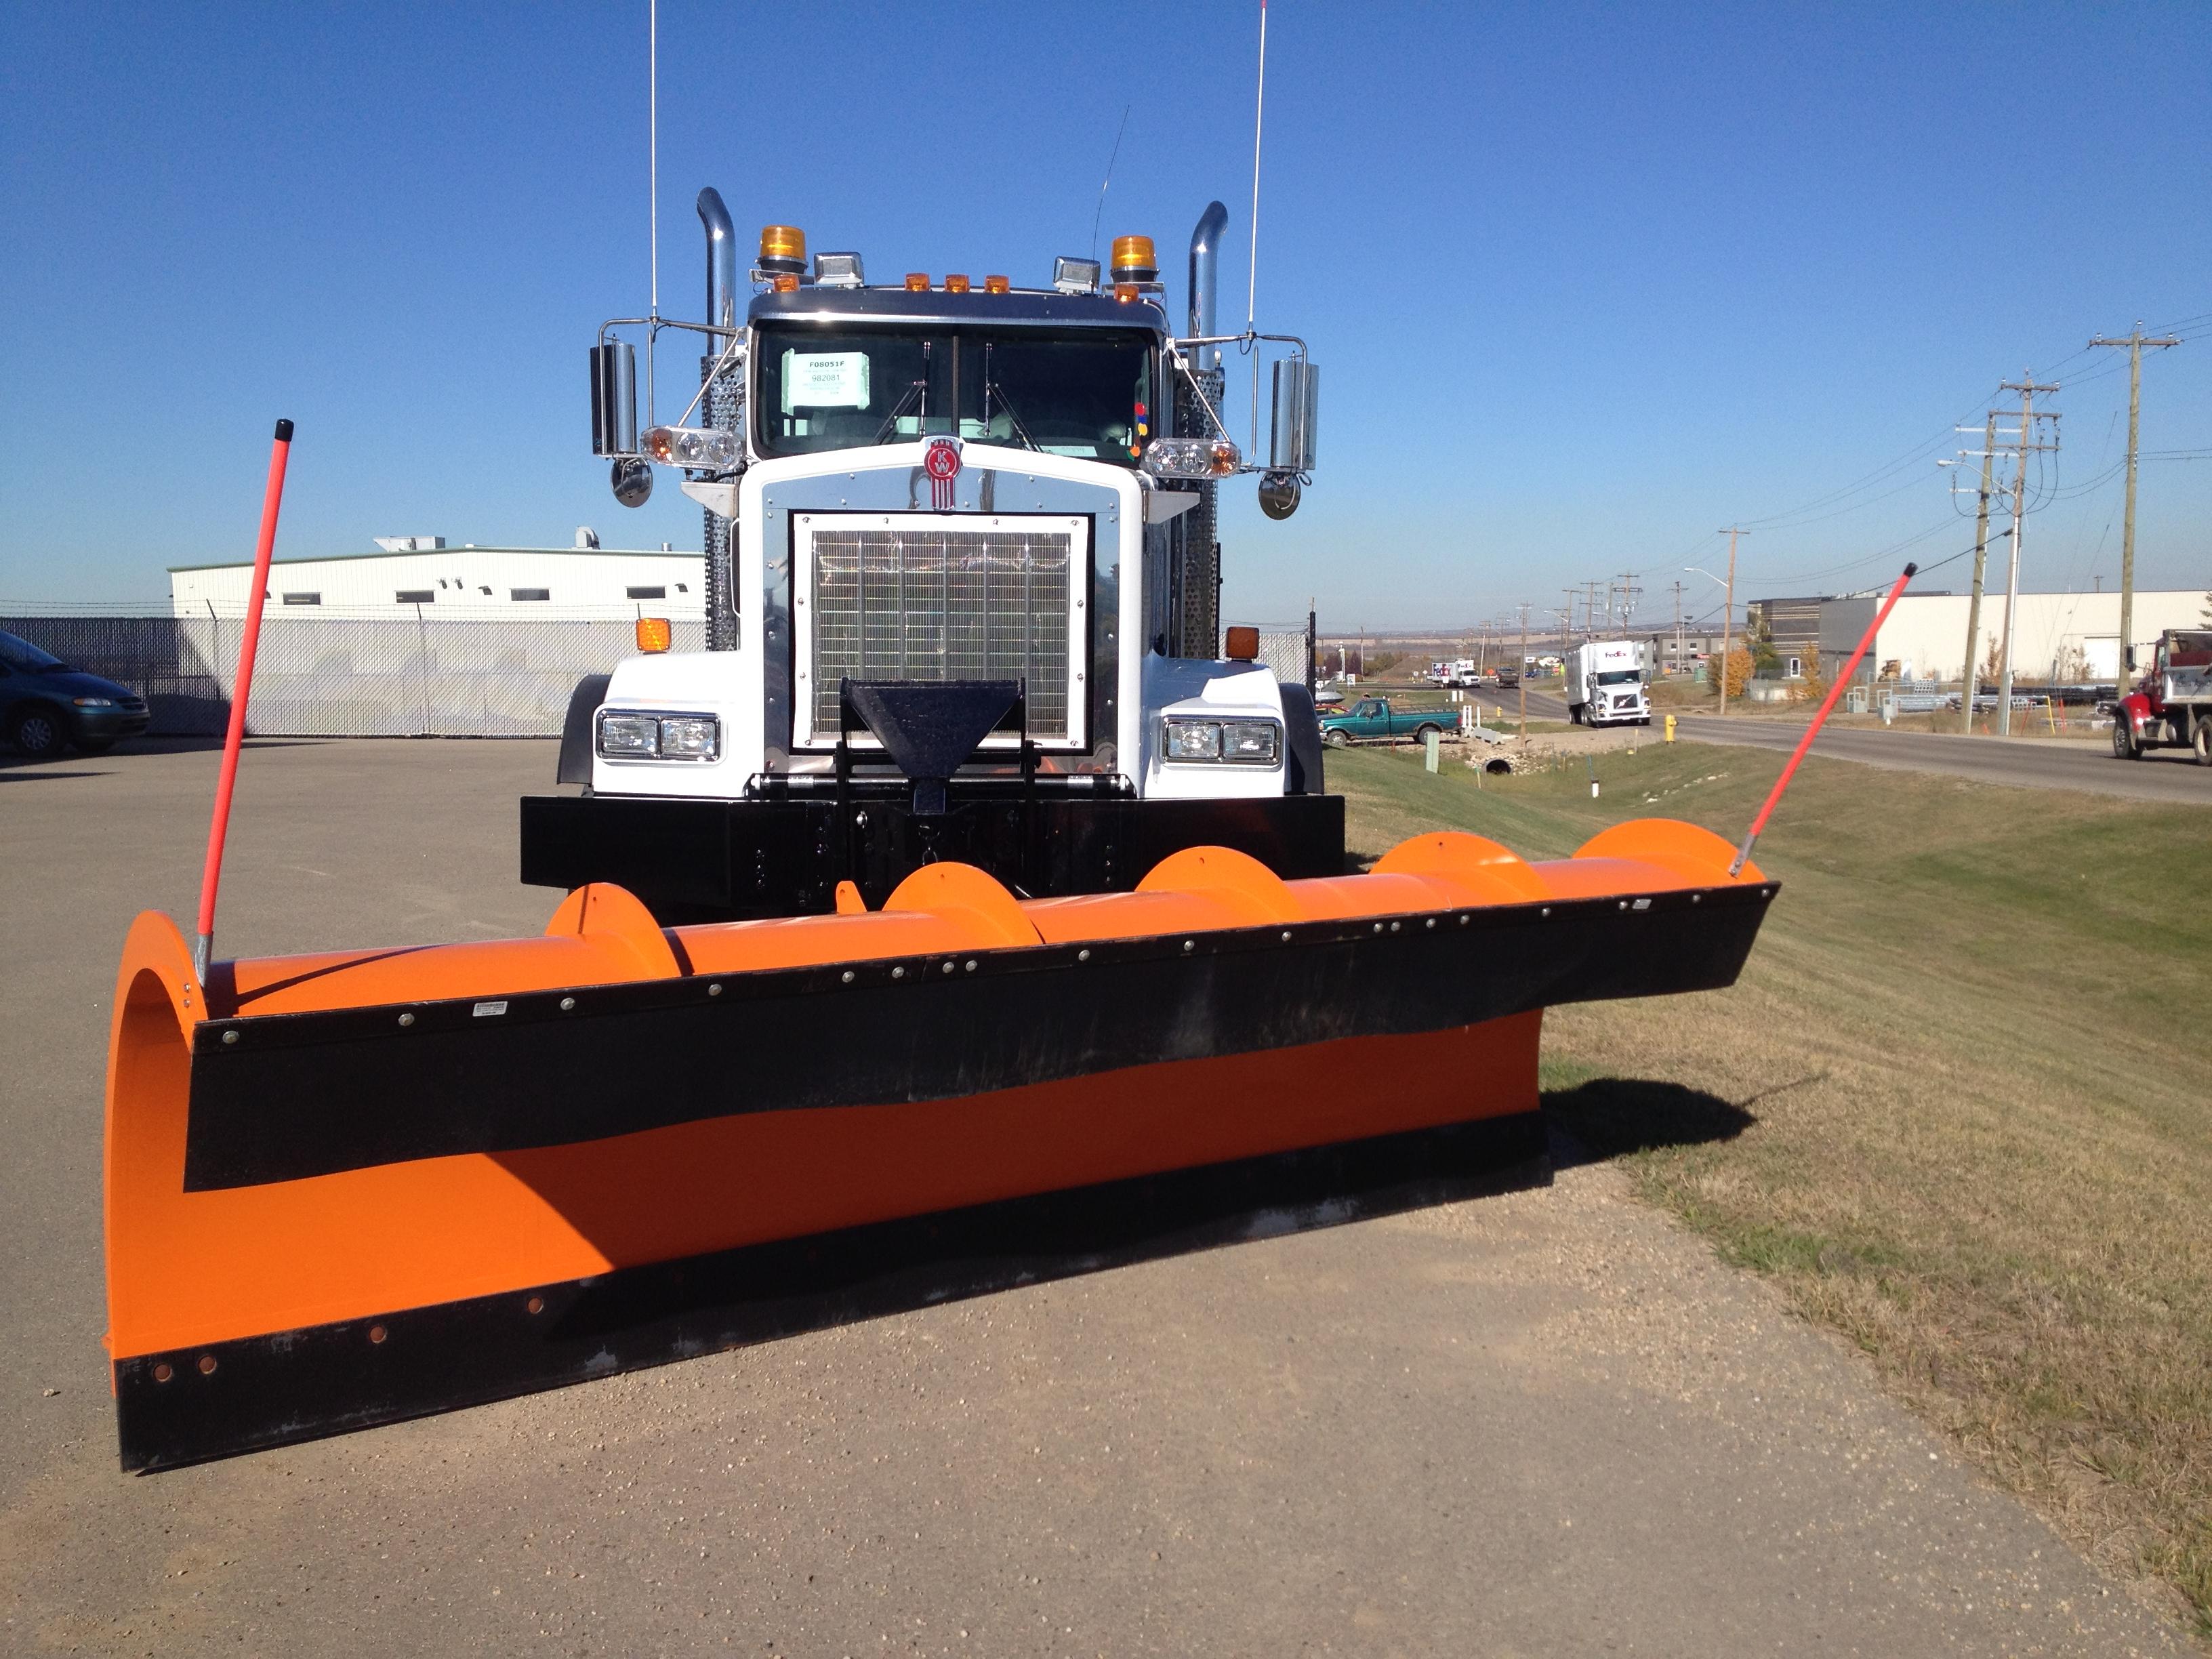 Monroe Truck Equipment >> Monroe Plow & Sander and Bibeau Dump Body on Kenworth T-800 - Commercial Truck Equipment